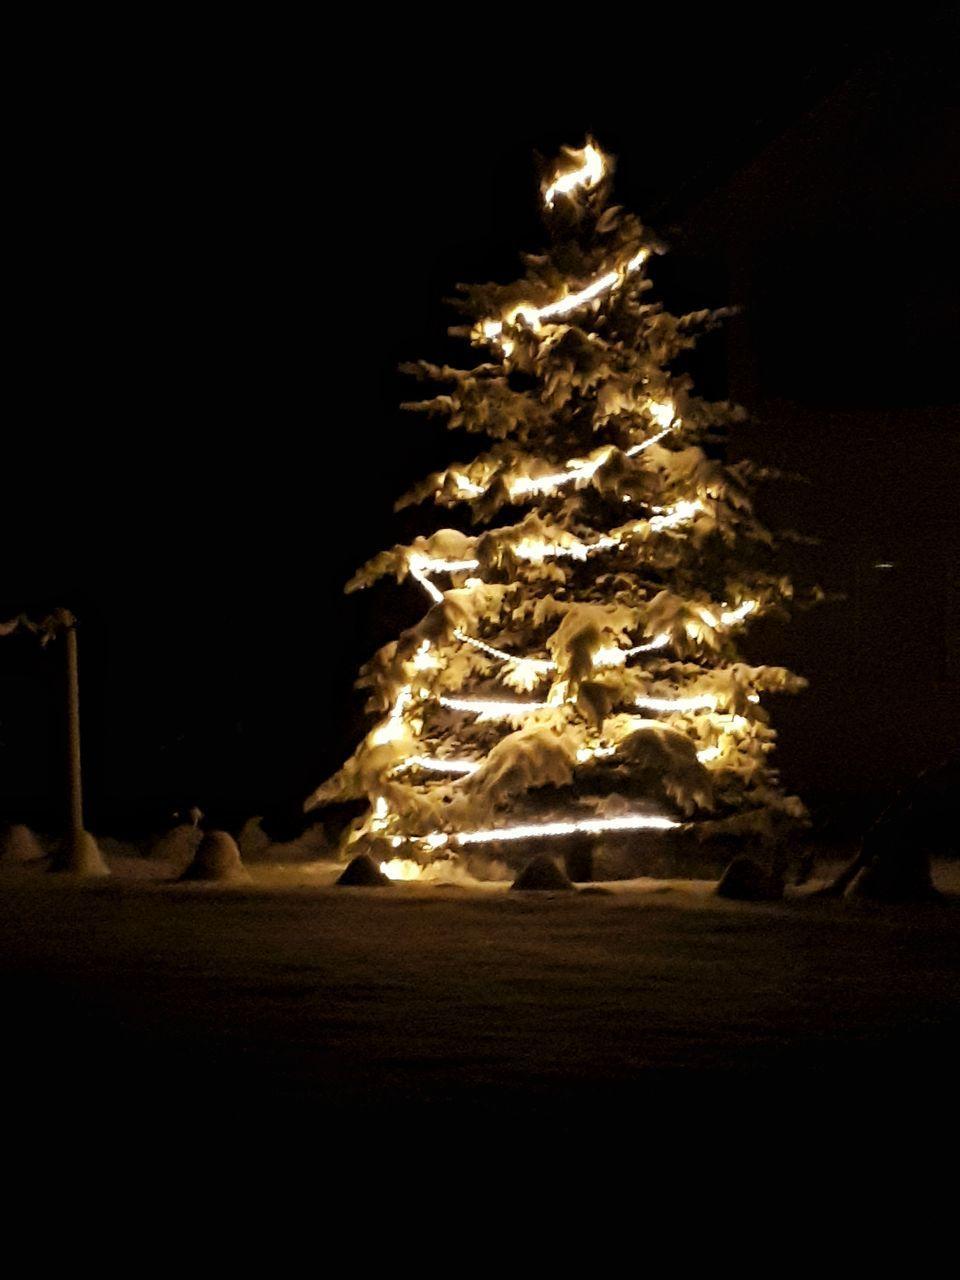 ILLUMINATED CHRISTMAS TREE IN NIGHT